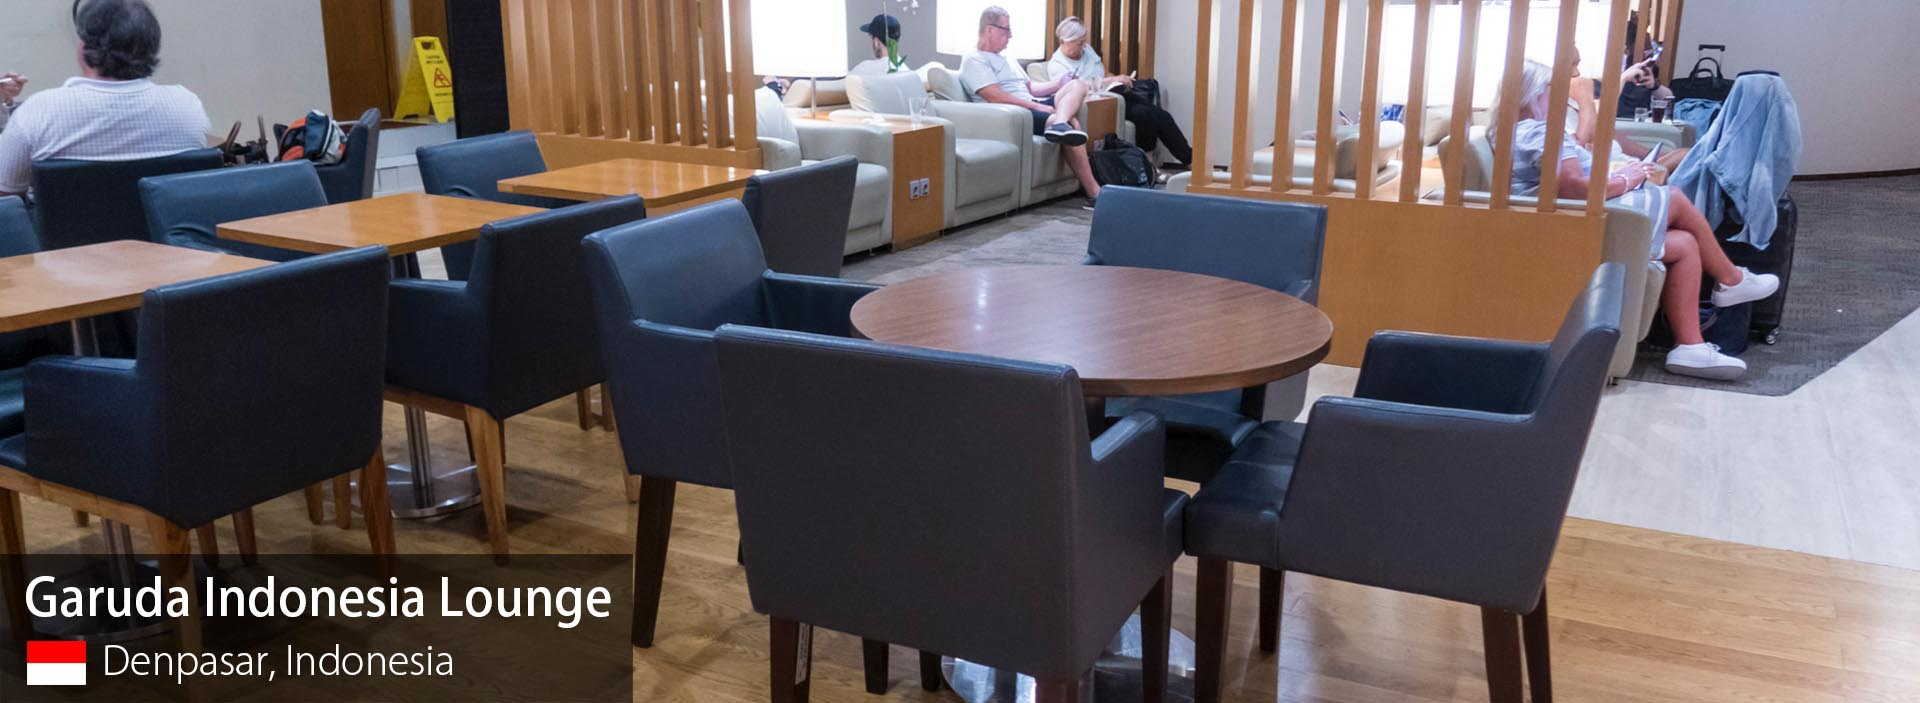 Review: Garuda Indonesia Business Class Lounge at Denpasar Bali Airport